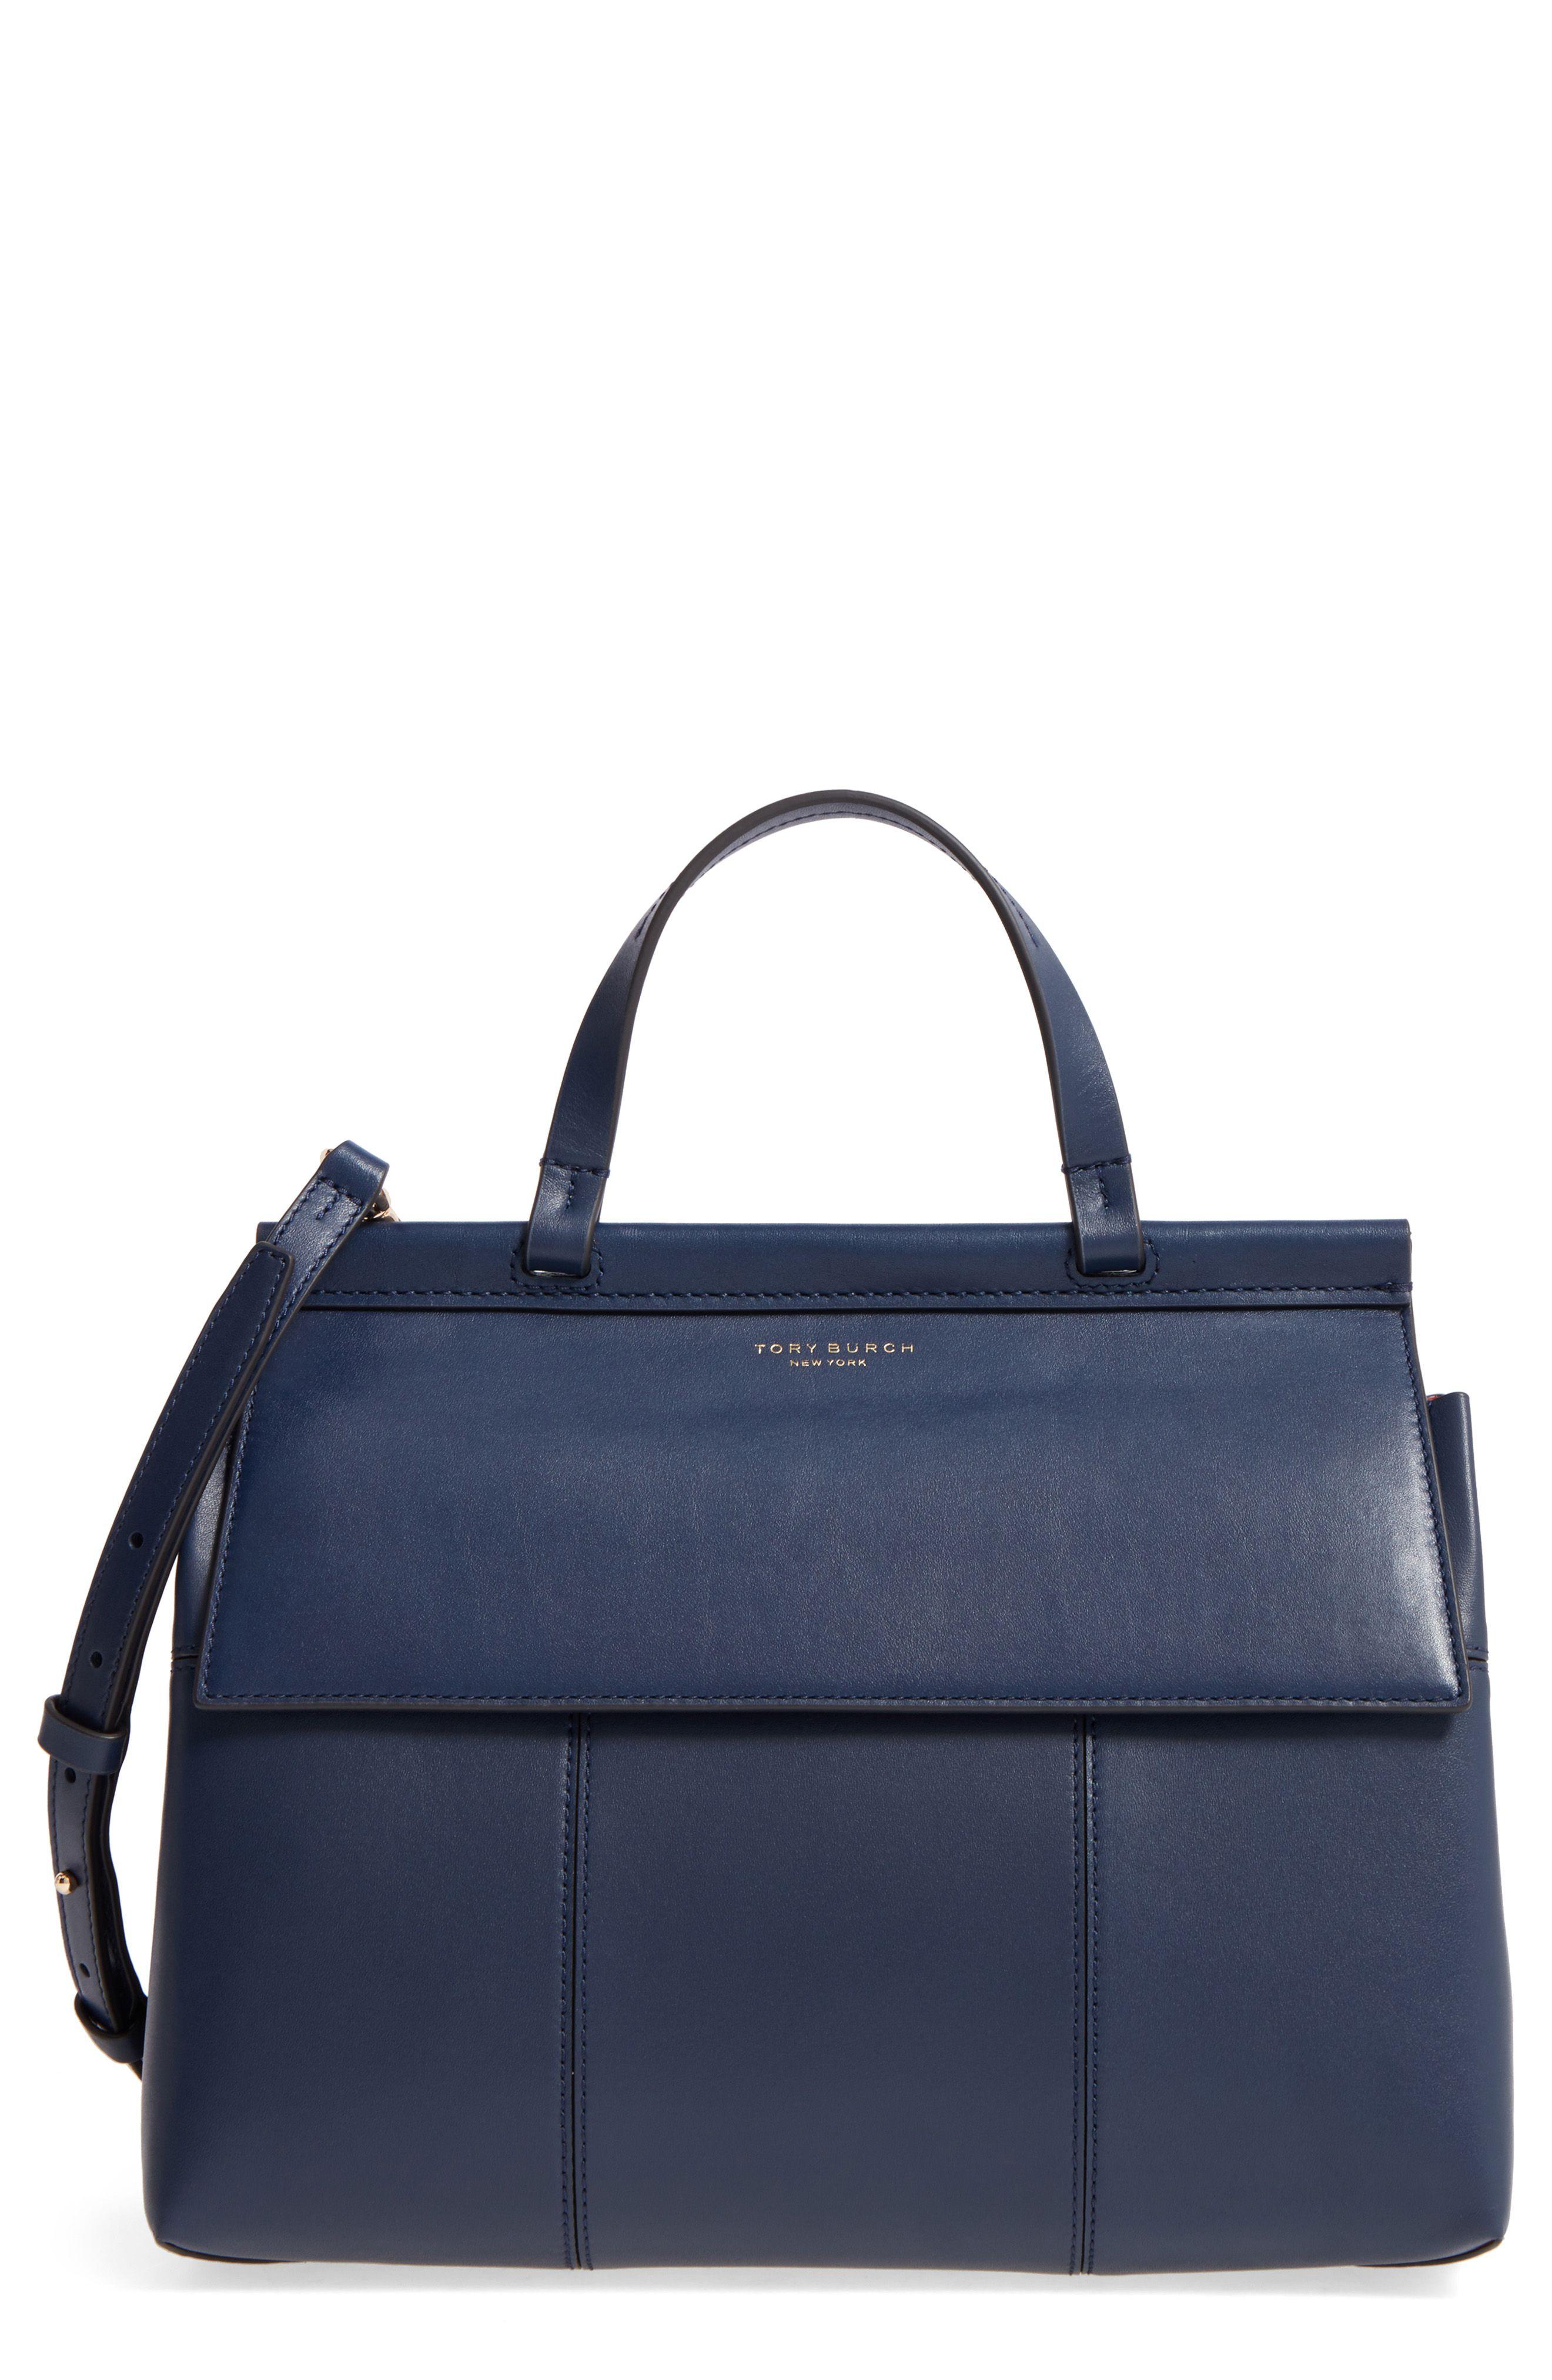 9b6f7bc3b13d Block T Leather Top Handle Satchel